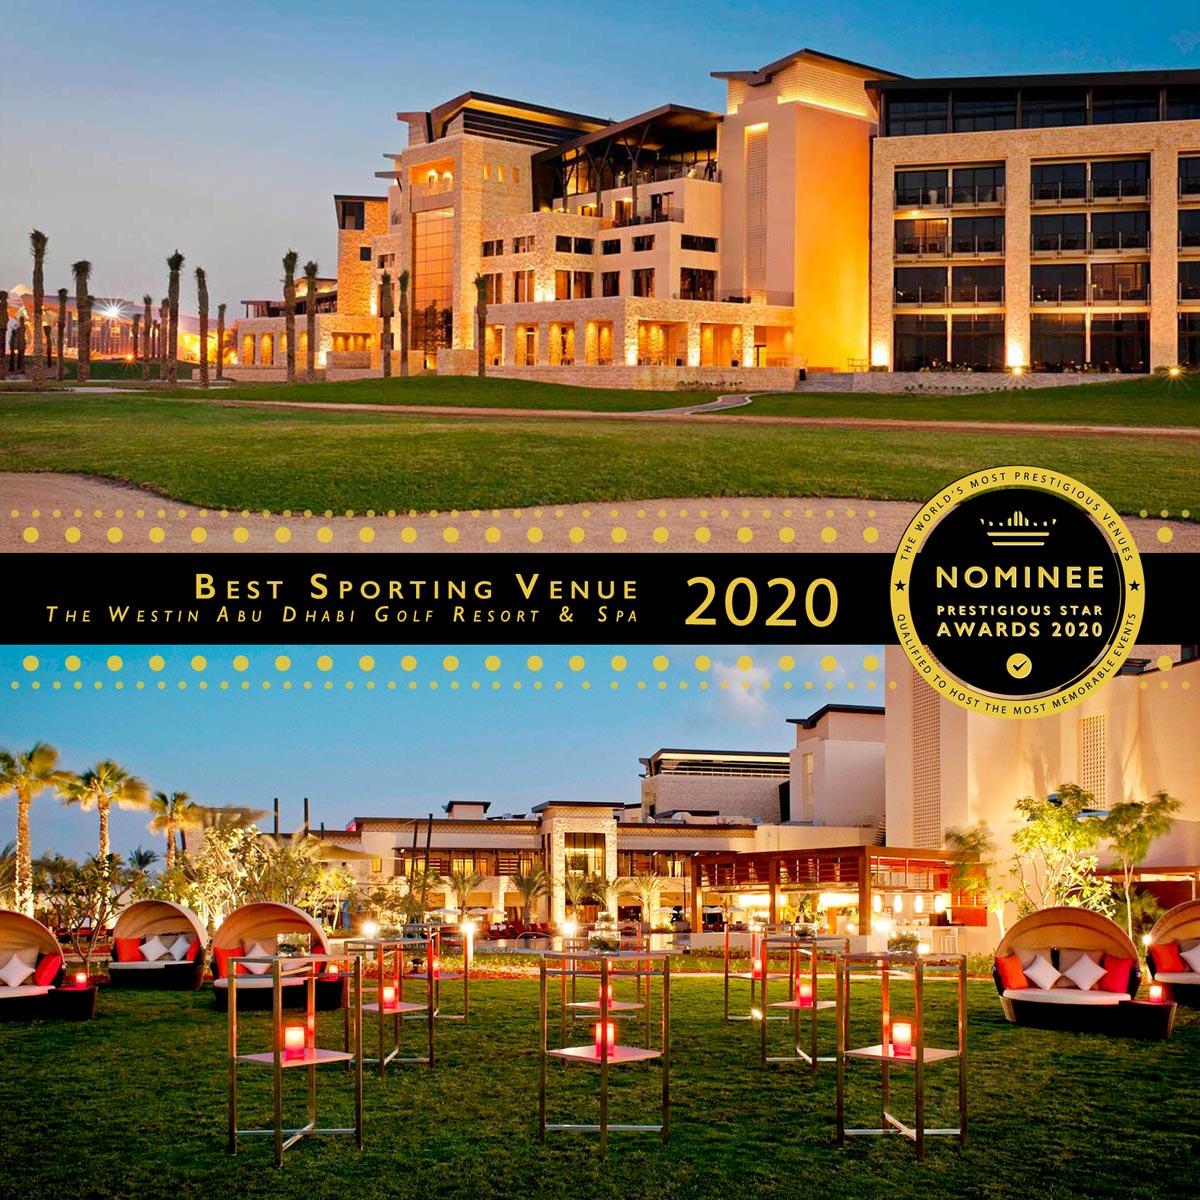 Event Lawn at The Westin Abu Dhabi Golf Resort & Spa